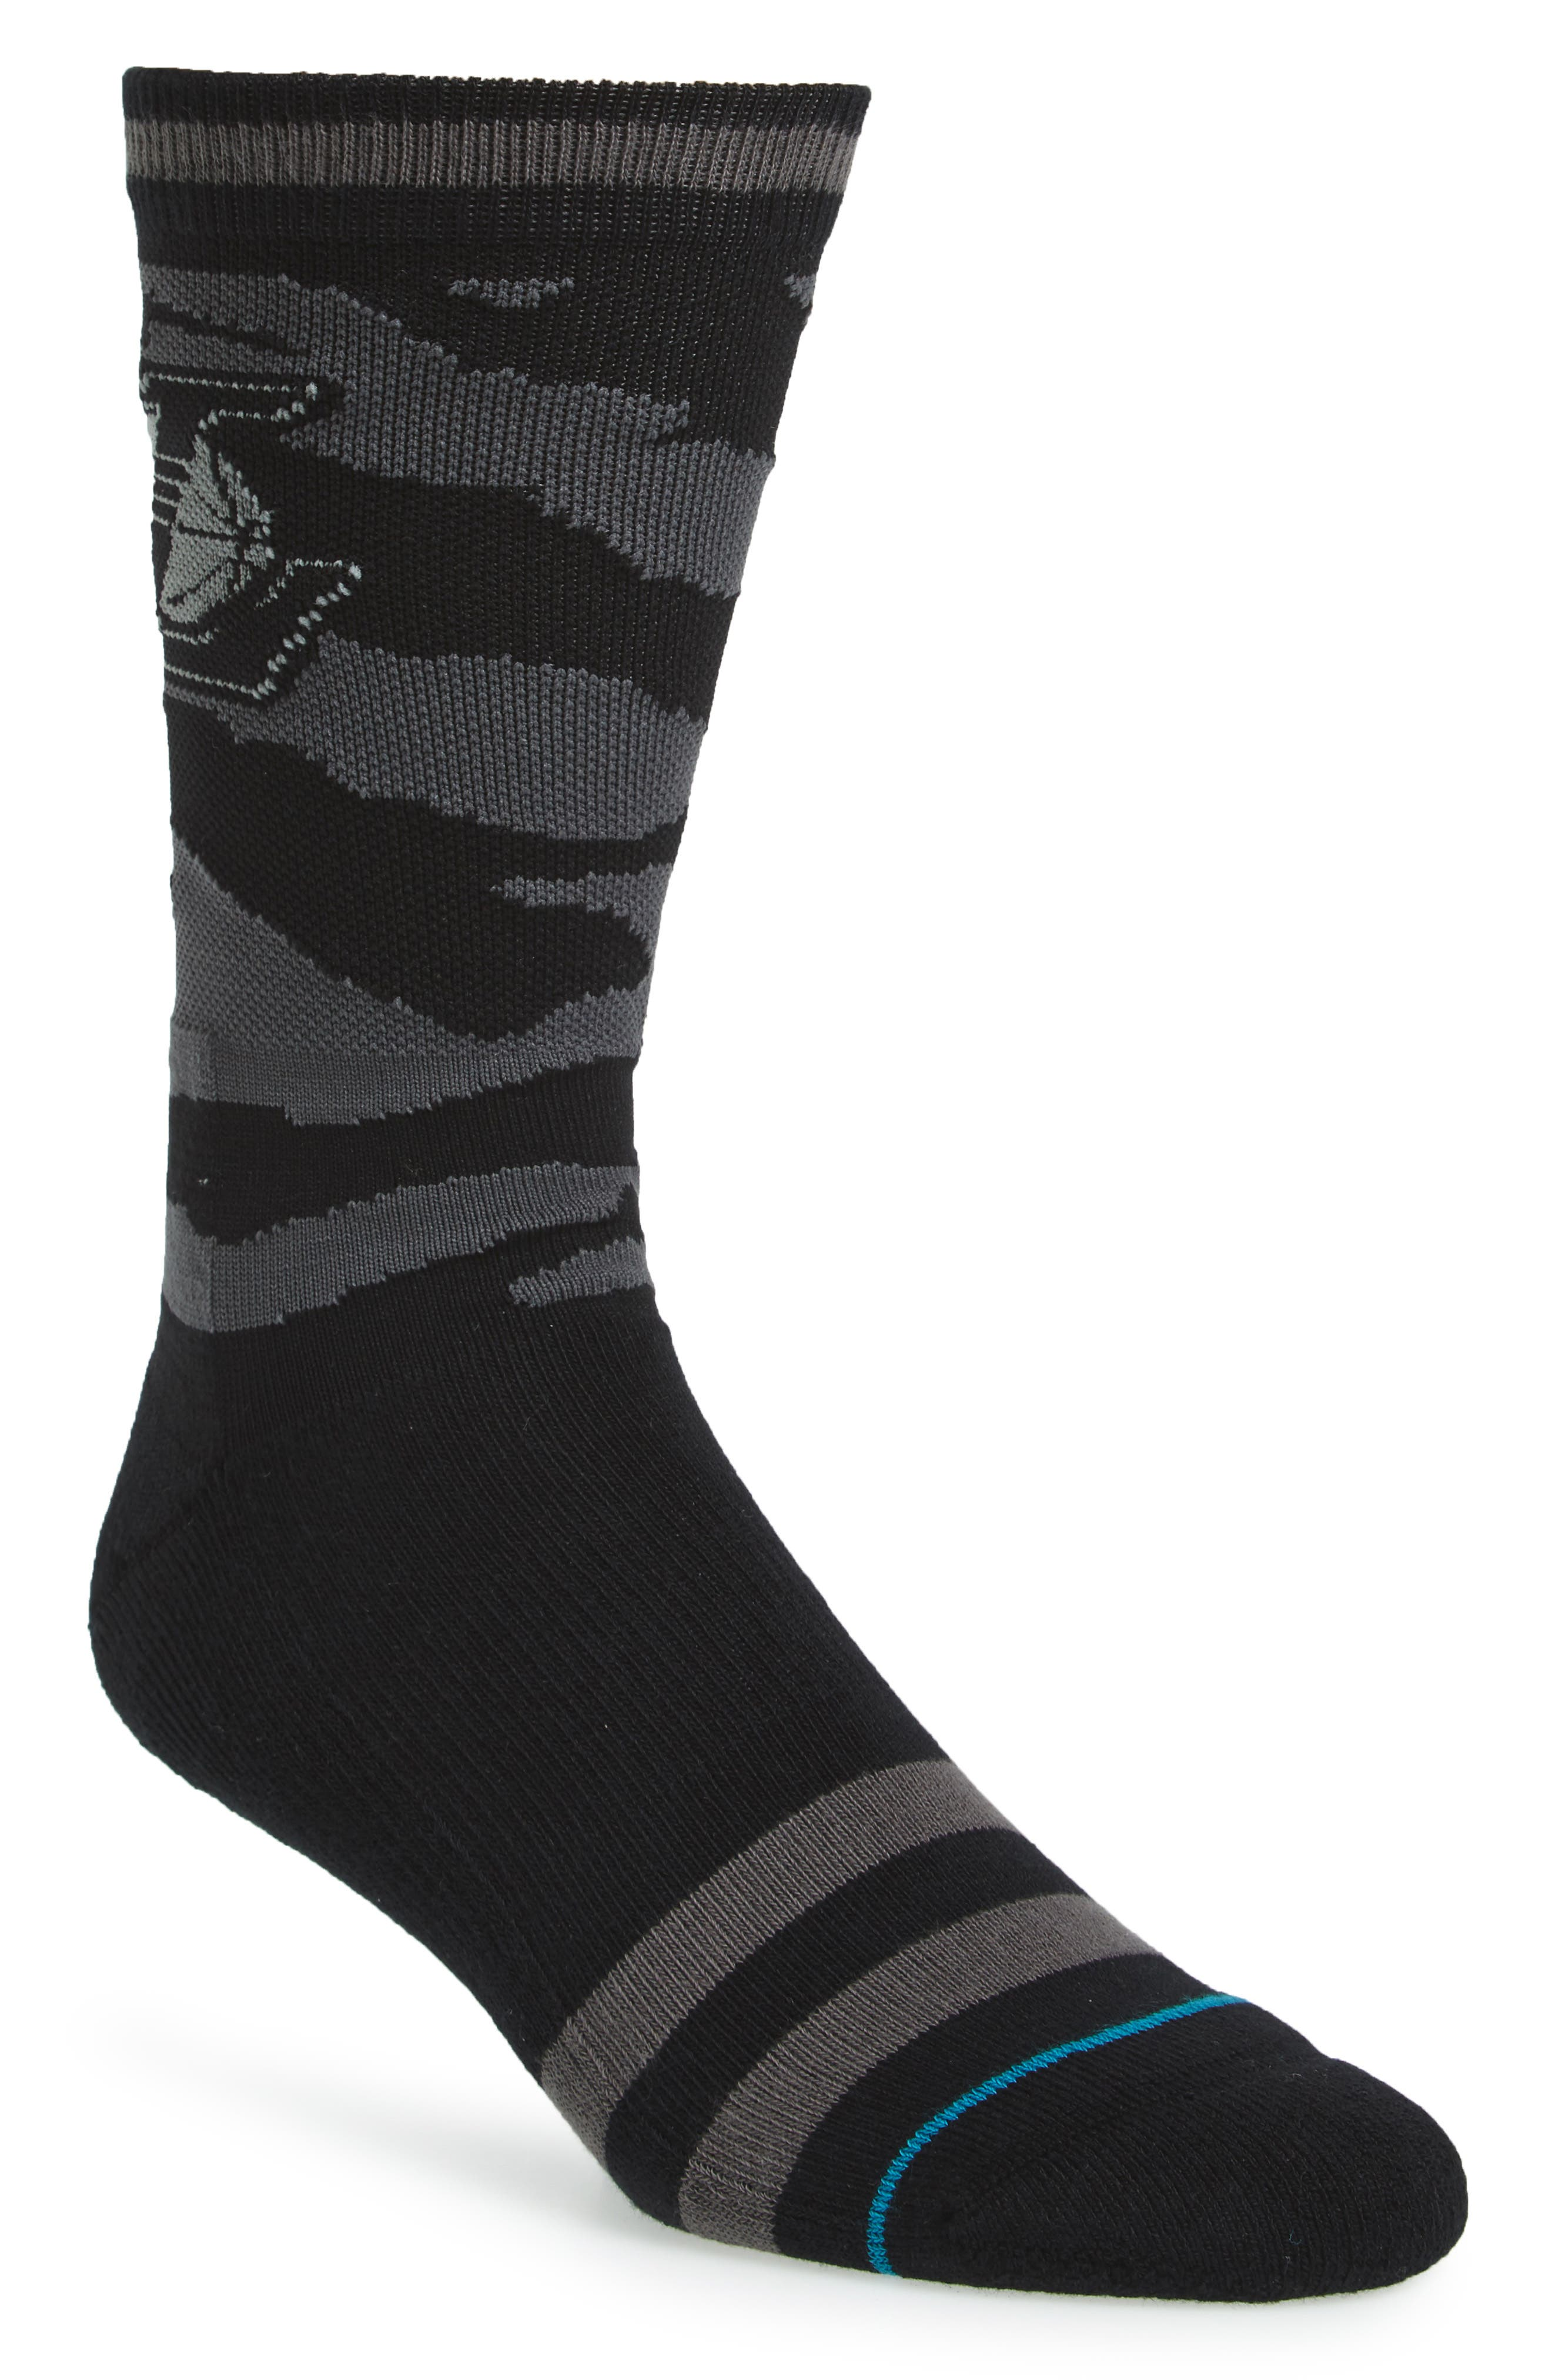 NBA Casual Nightfall Lakers Socks,                             Main thumbnail 1, color,                             Black